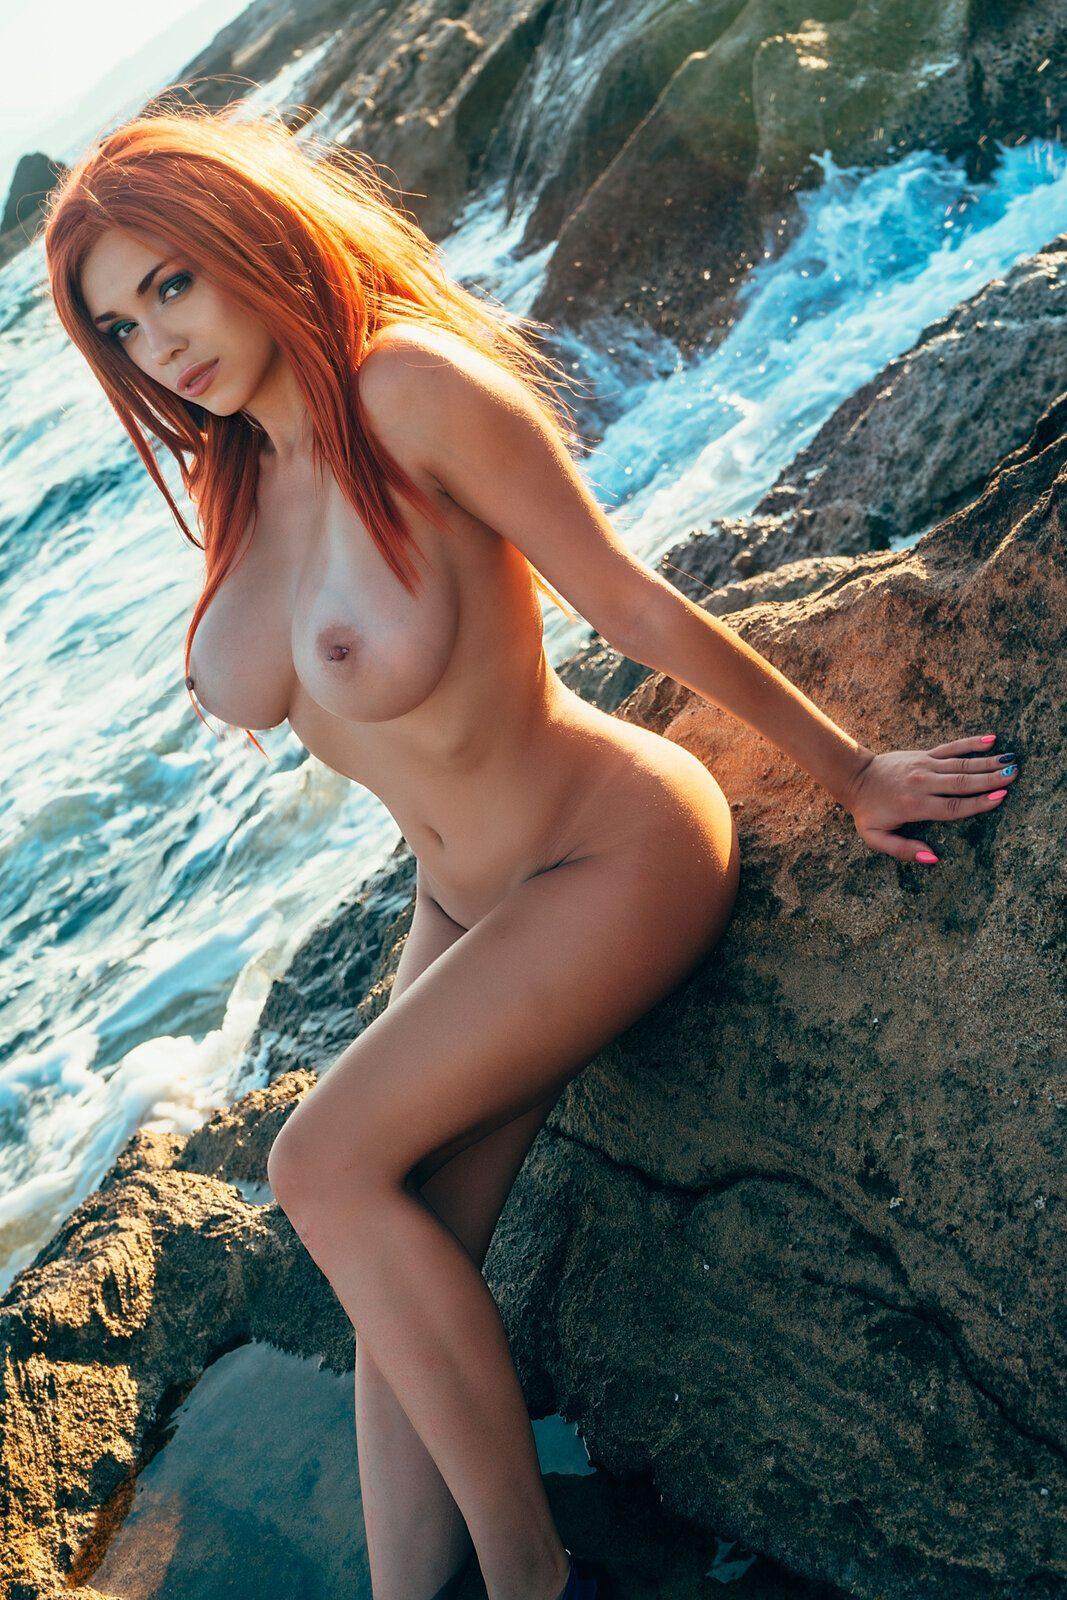 Mermaid Tits